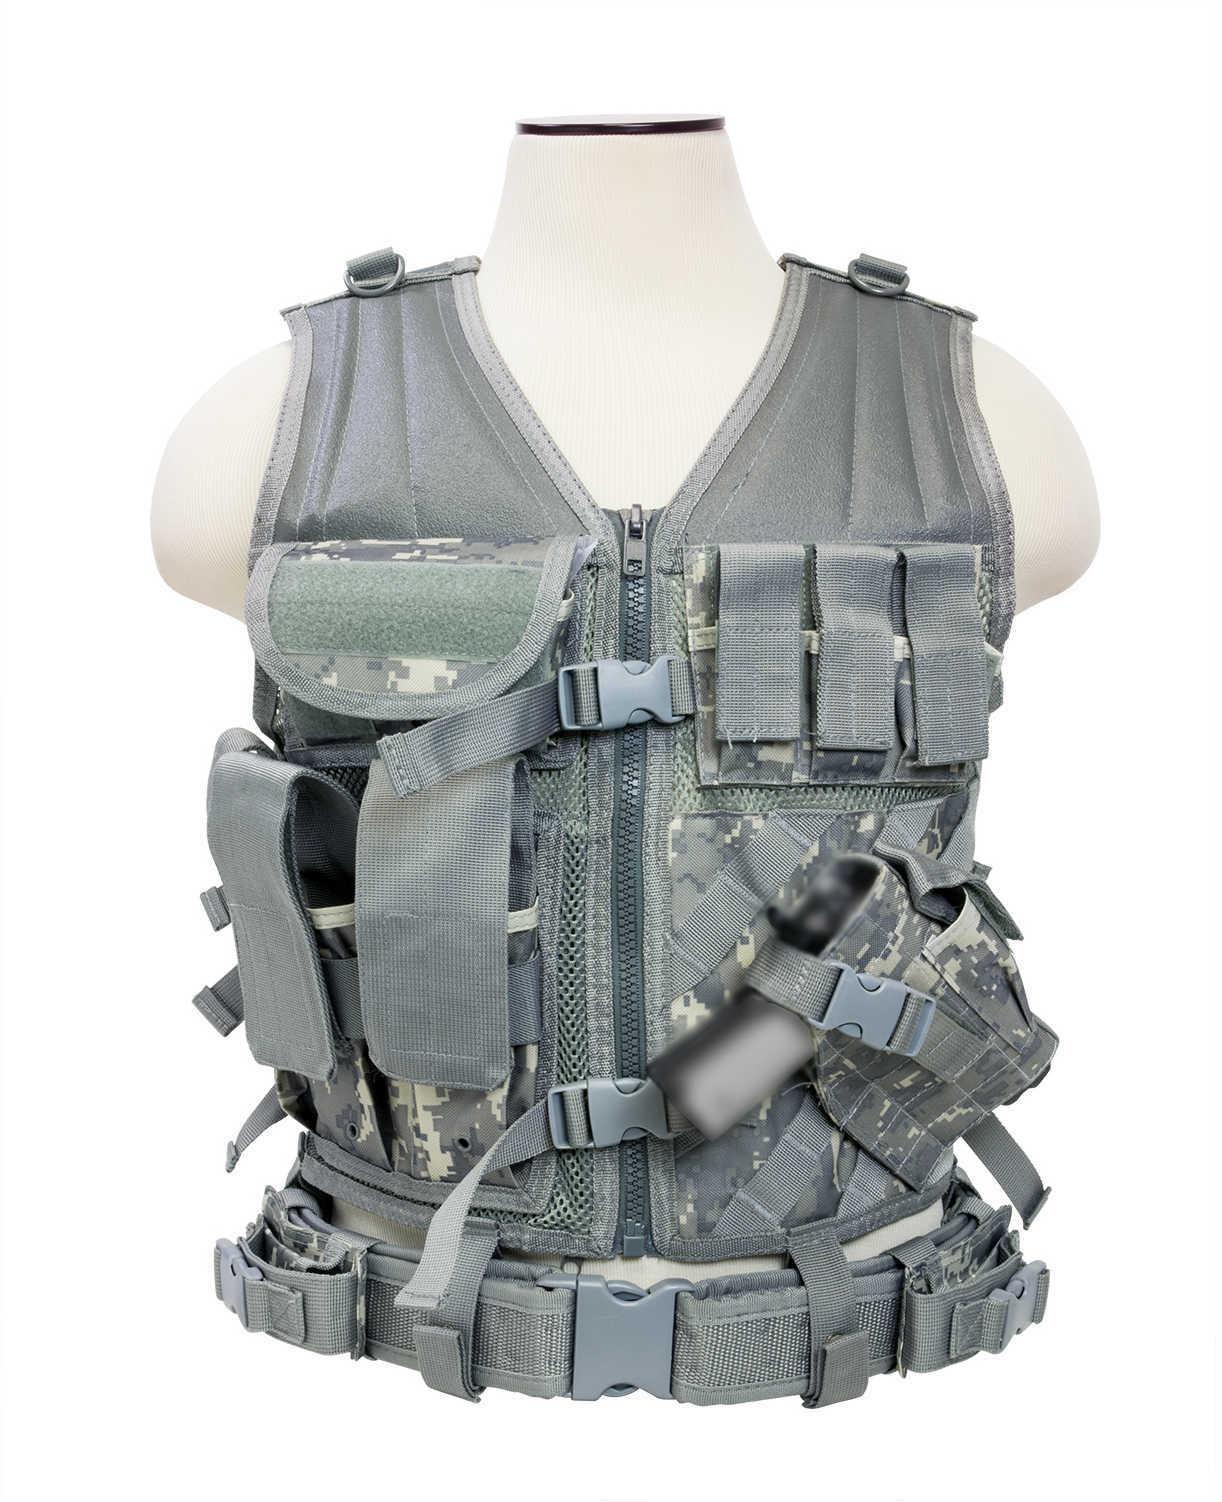 NCSTAR Tactical Vest Nylon Digital Camo Size Medium- 2XL Fully Adjustable PALS Webbing Pistol Mag Pouches Rifle Mag Pouc